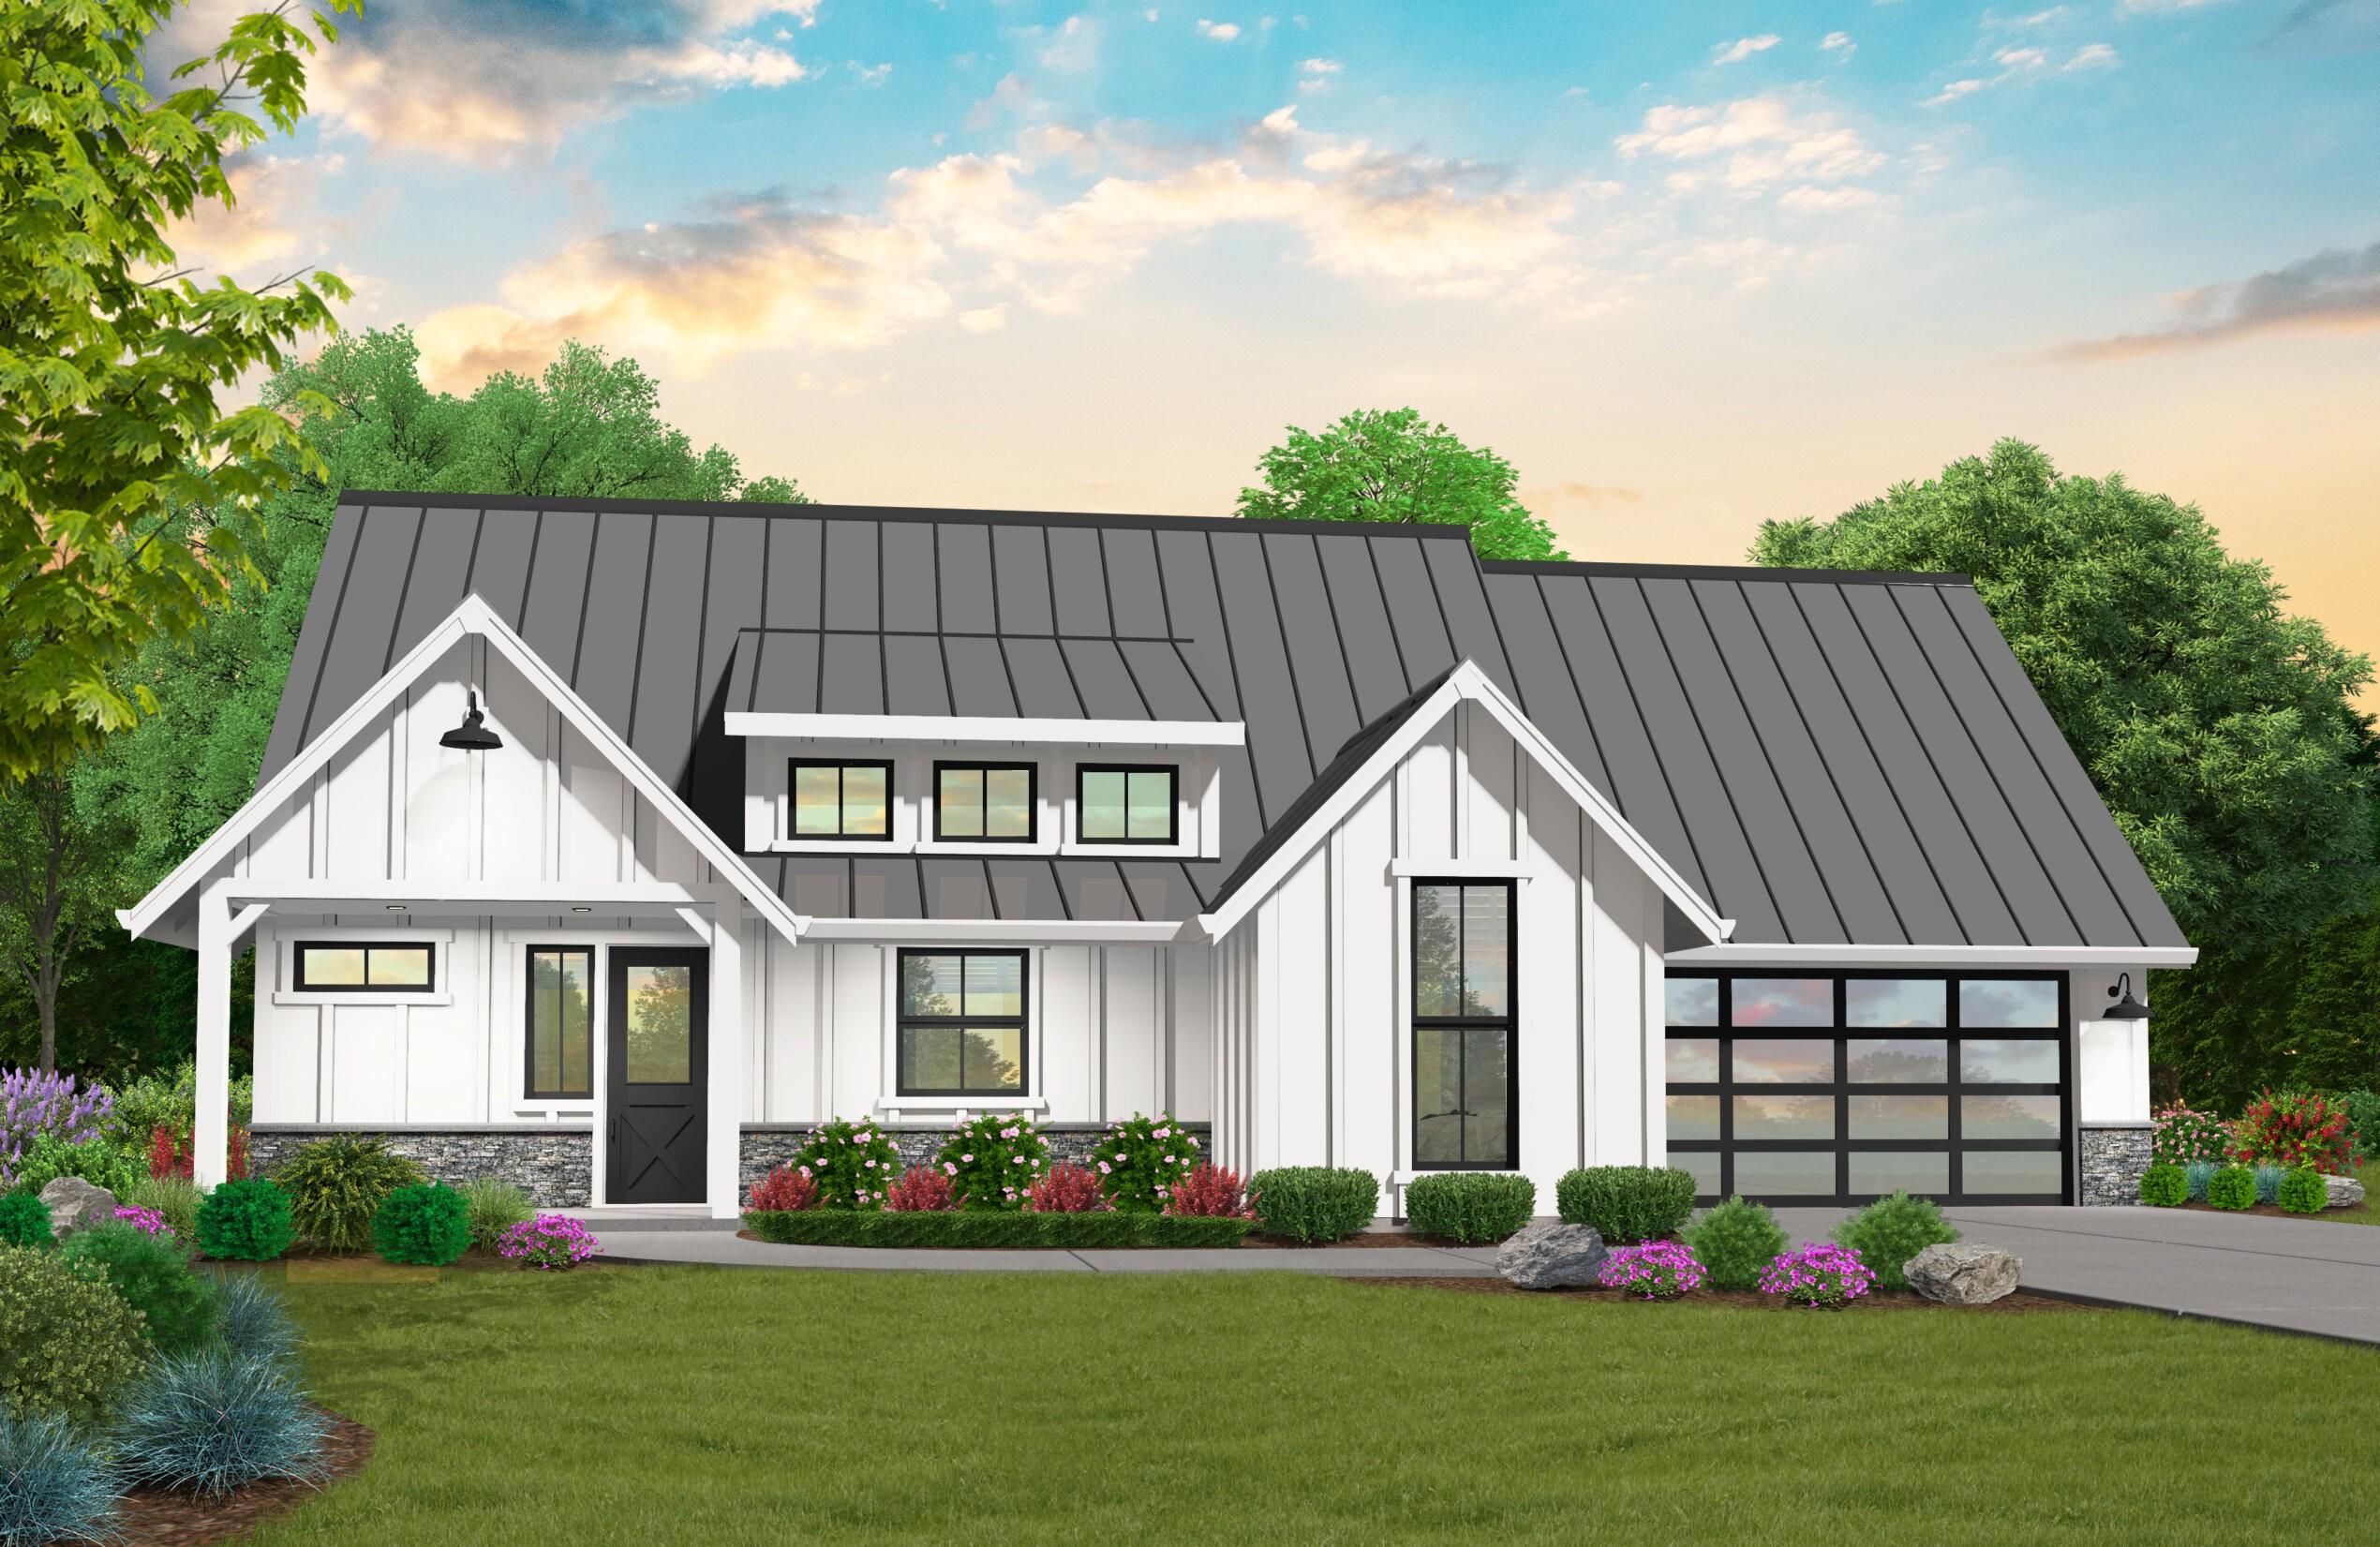 Cottage House Plans   Cottage Home Designs & Floor Plans with Photos